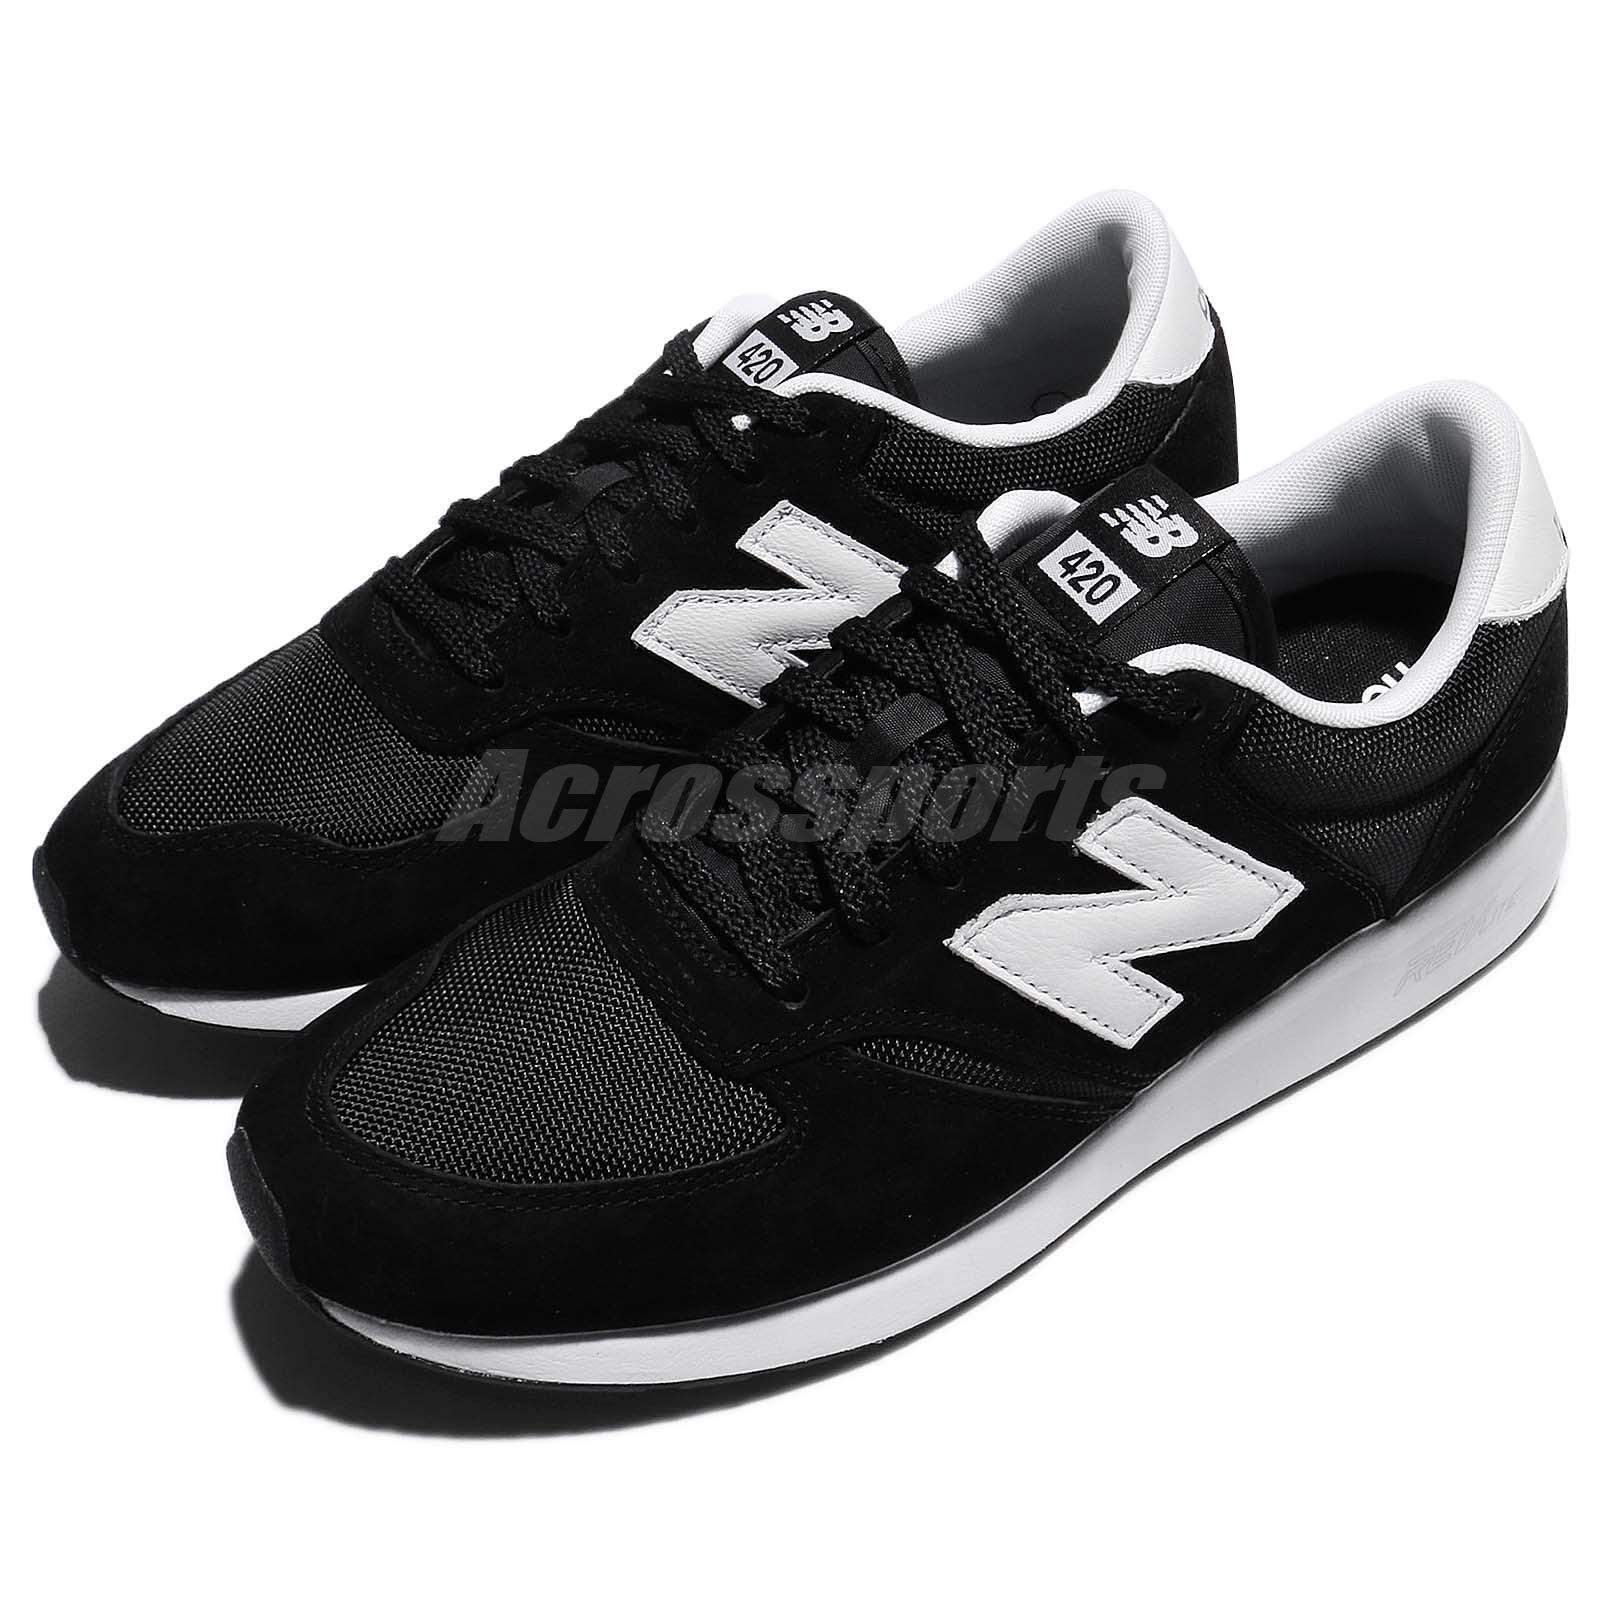 New Balance MRL420SZ D noir blanc homme fonctionnement chaussures NB 420 RevLite MRL420SZD